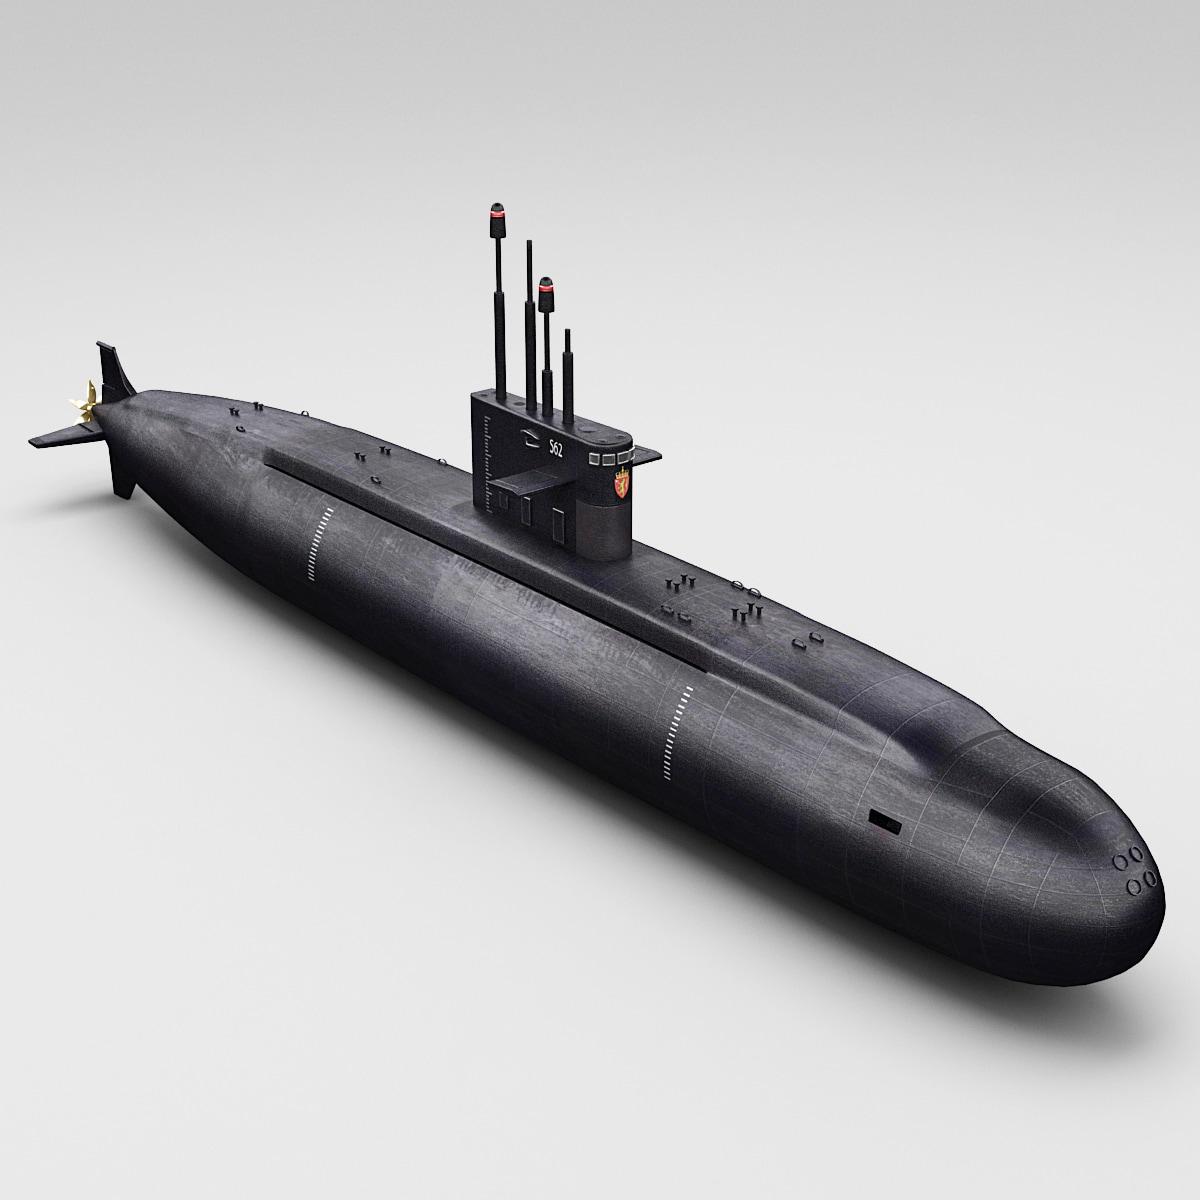 russian lada class submarine 3d 3ds